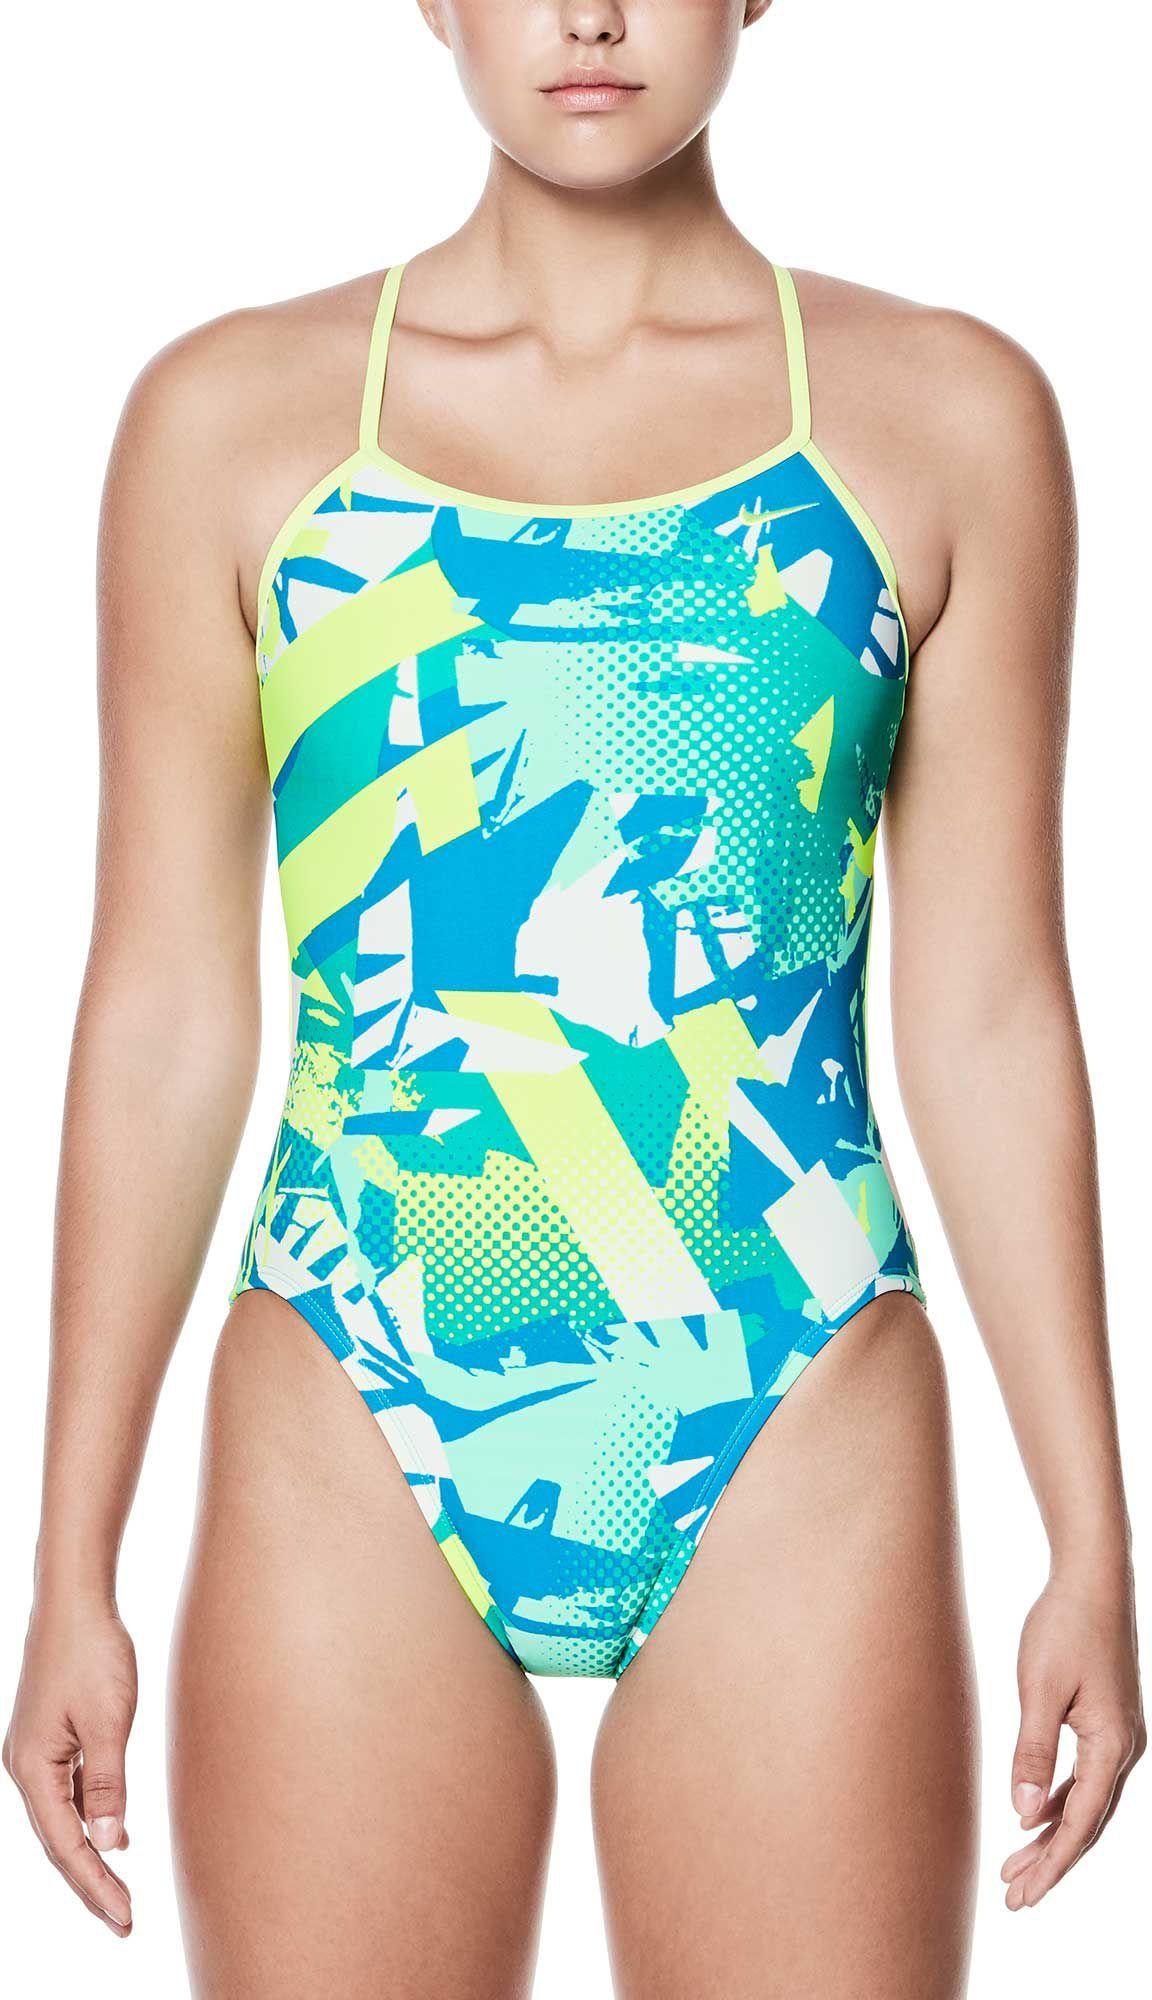 4a213d63d76 Nike Women's Drift Graffiti Modern V-Back Swimsuit, Size: 26, Green